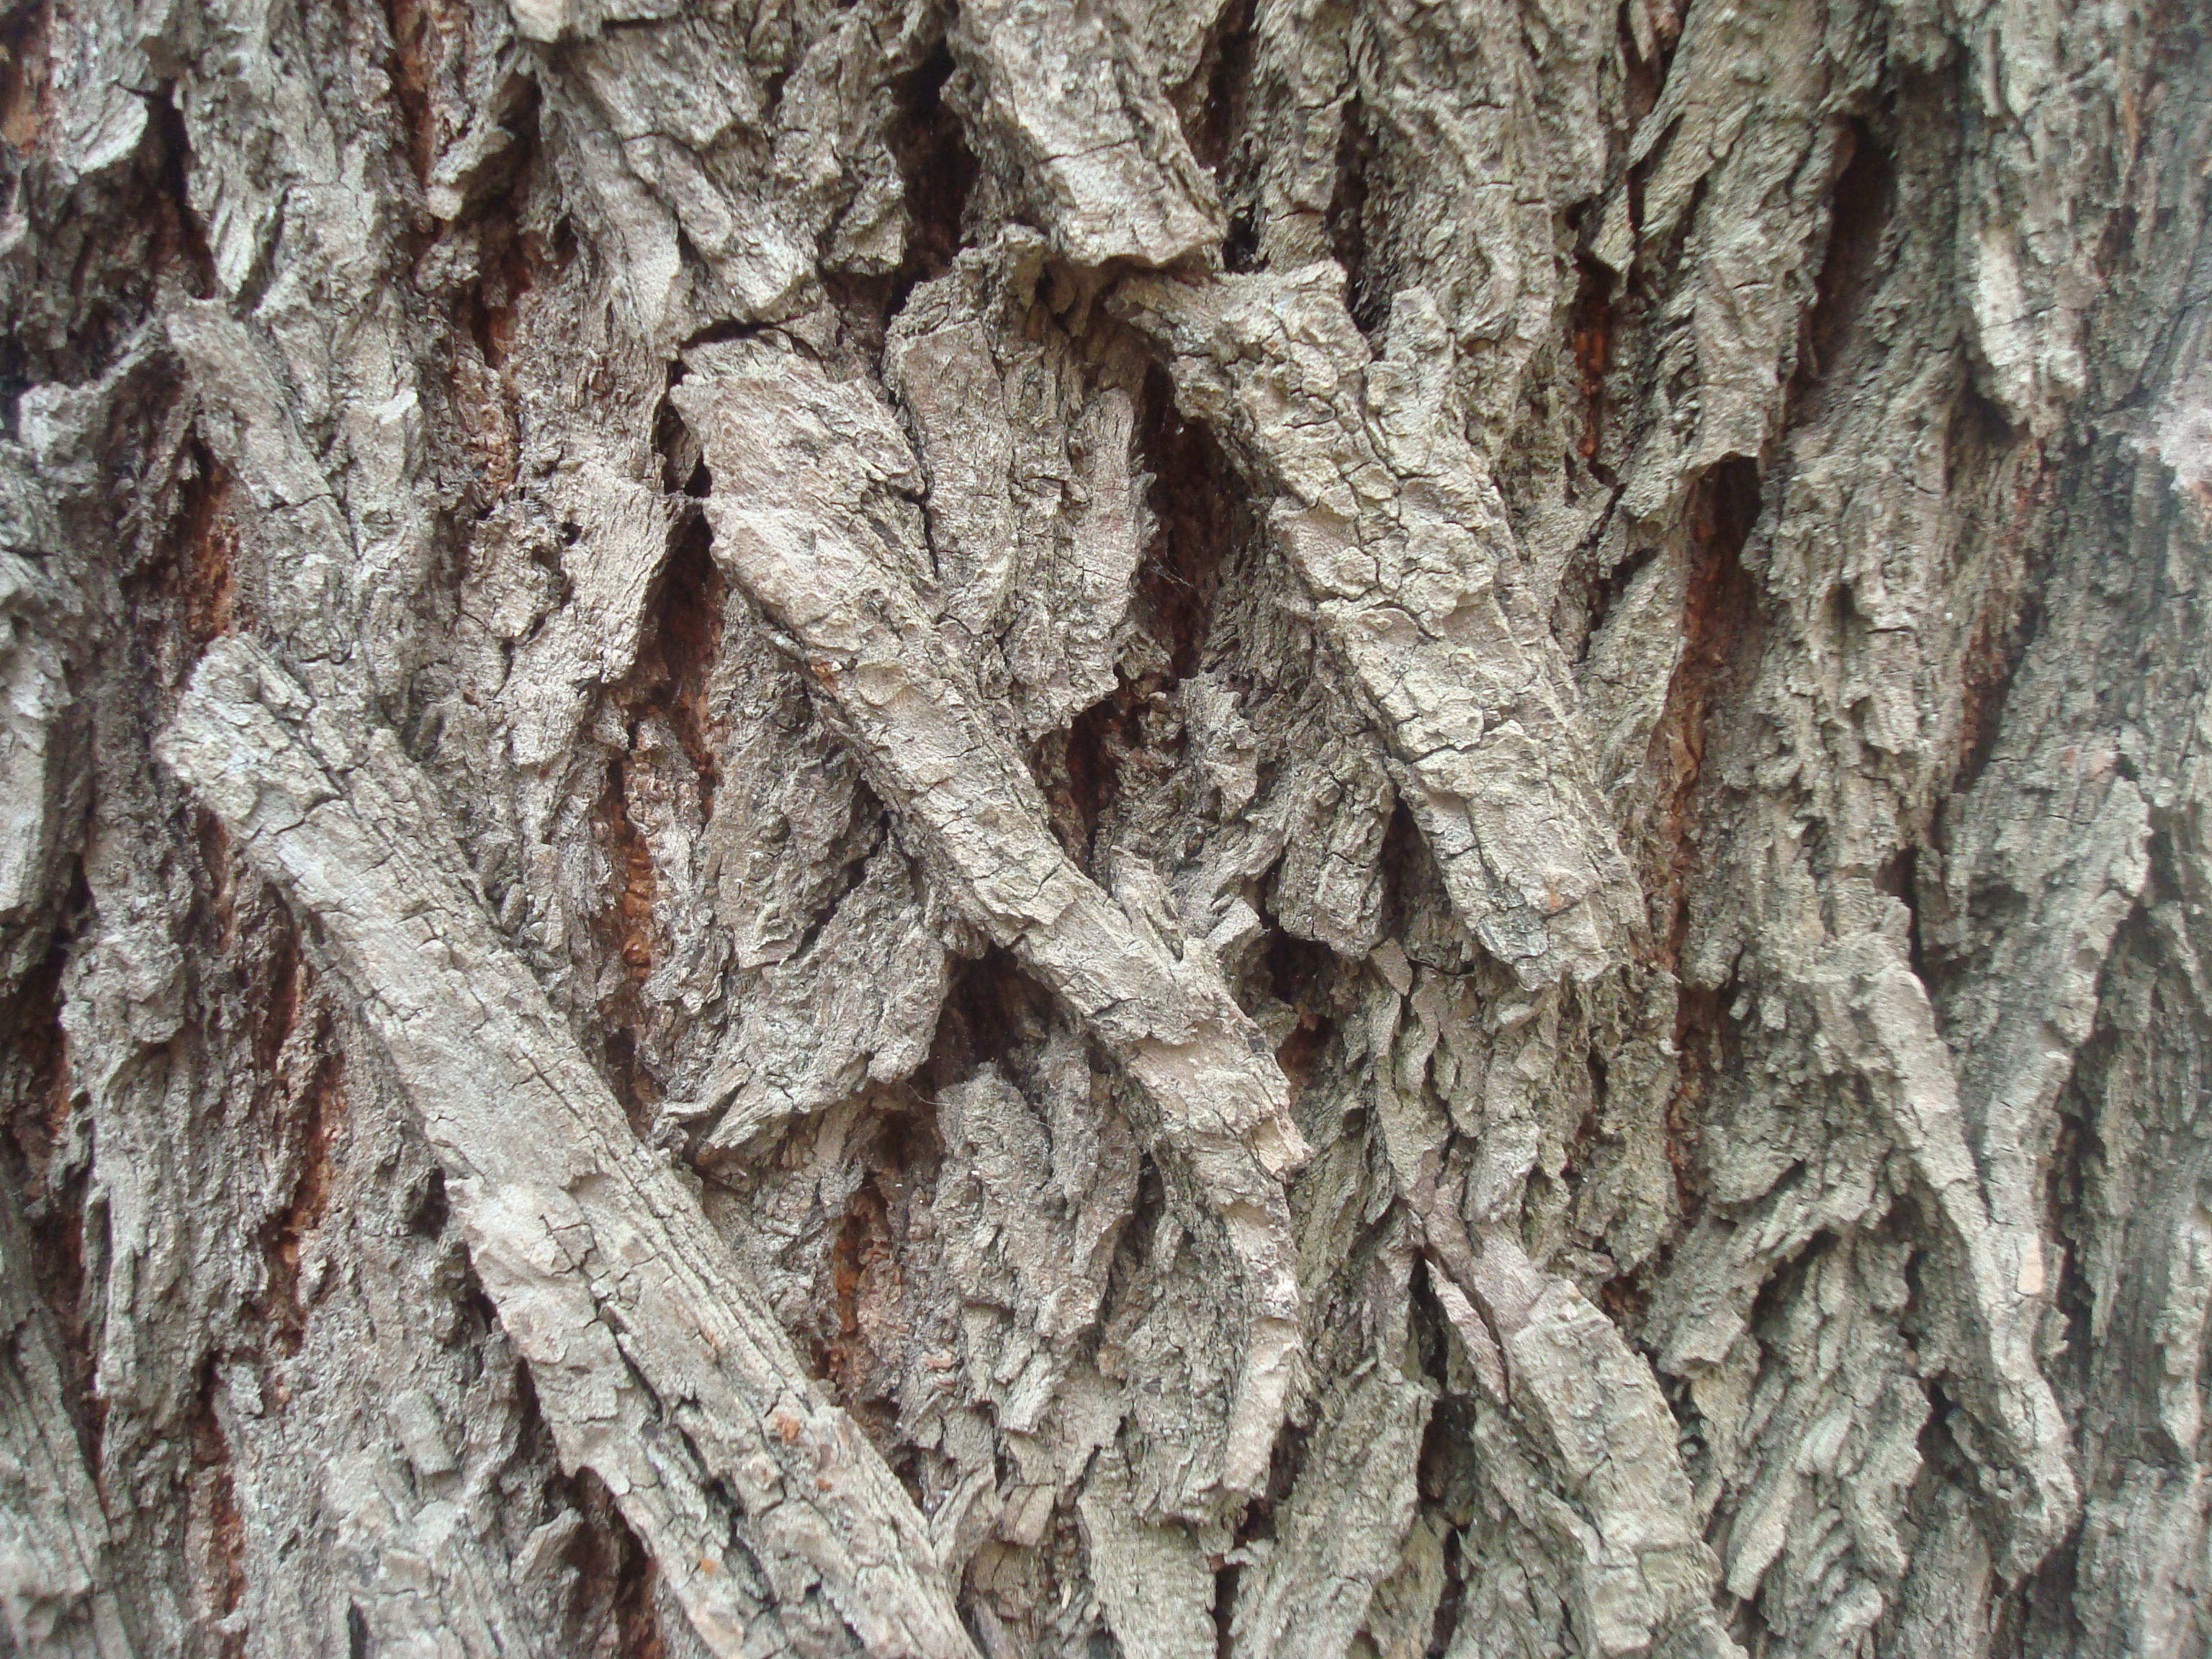 Dry wood texture photo